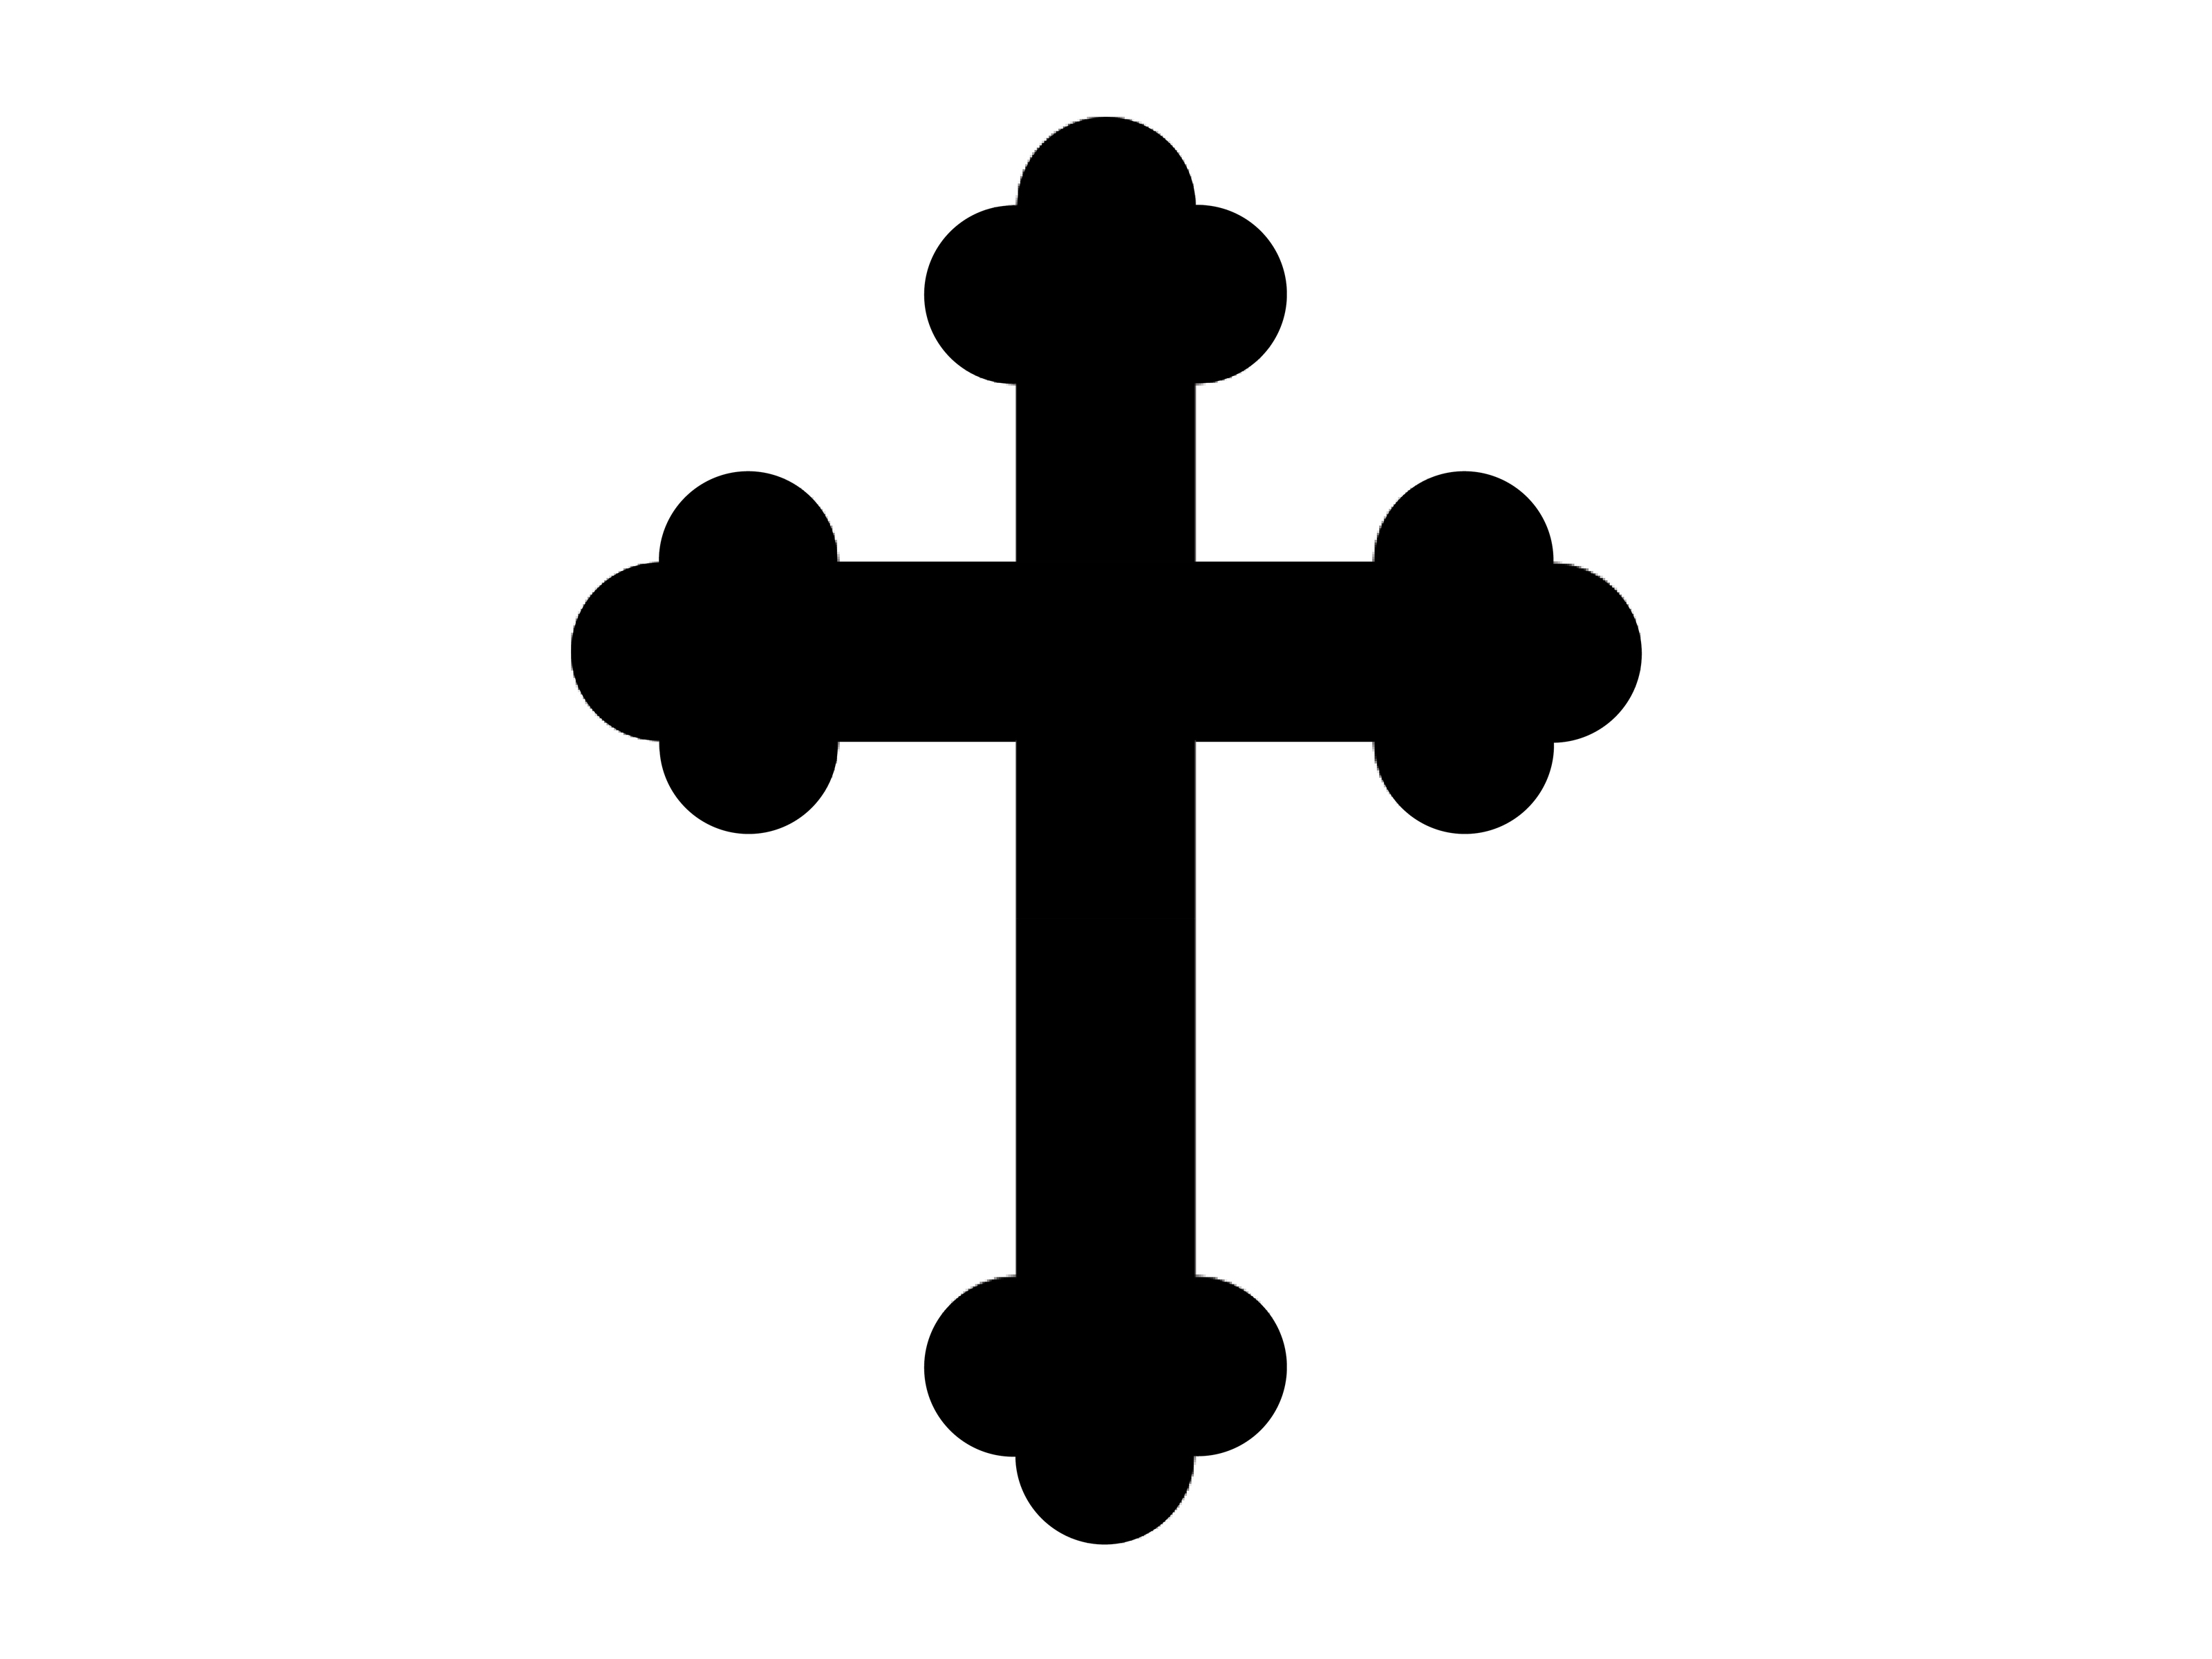 Simple Cross Line Art : Catholic cross drawing clipart panda free images